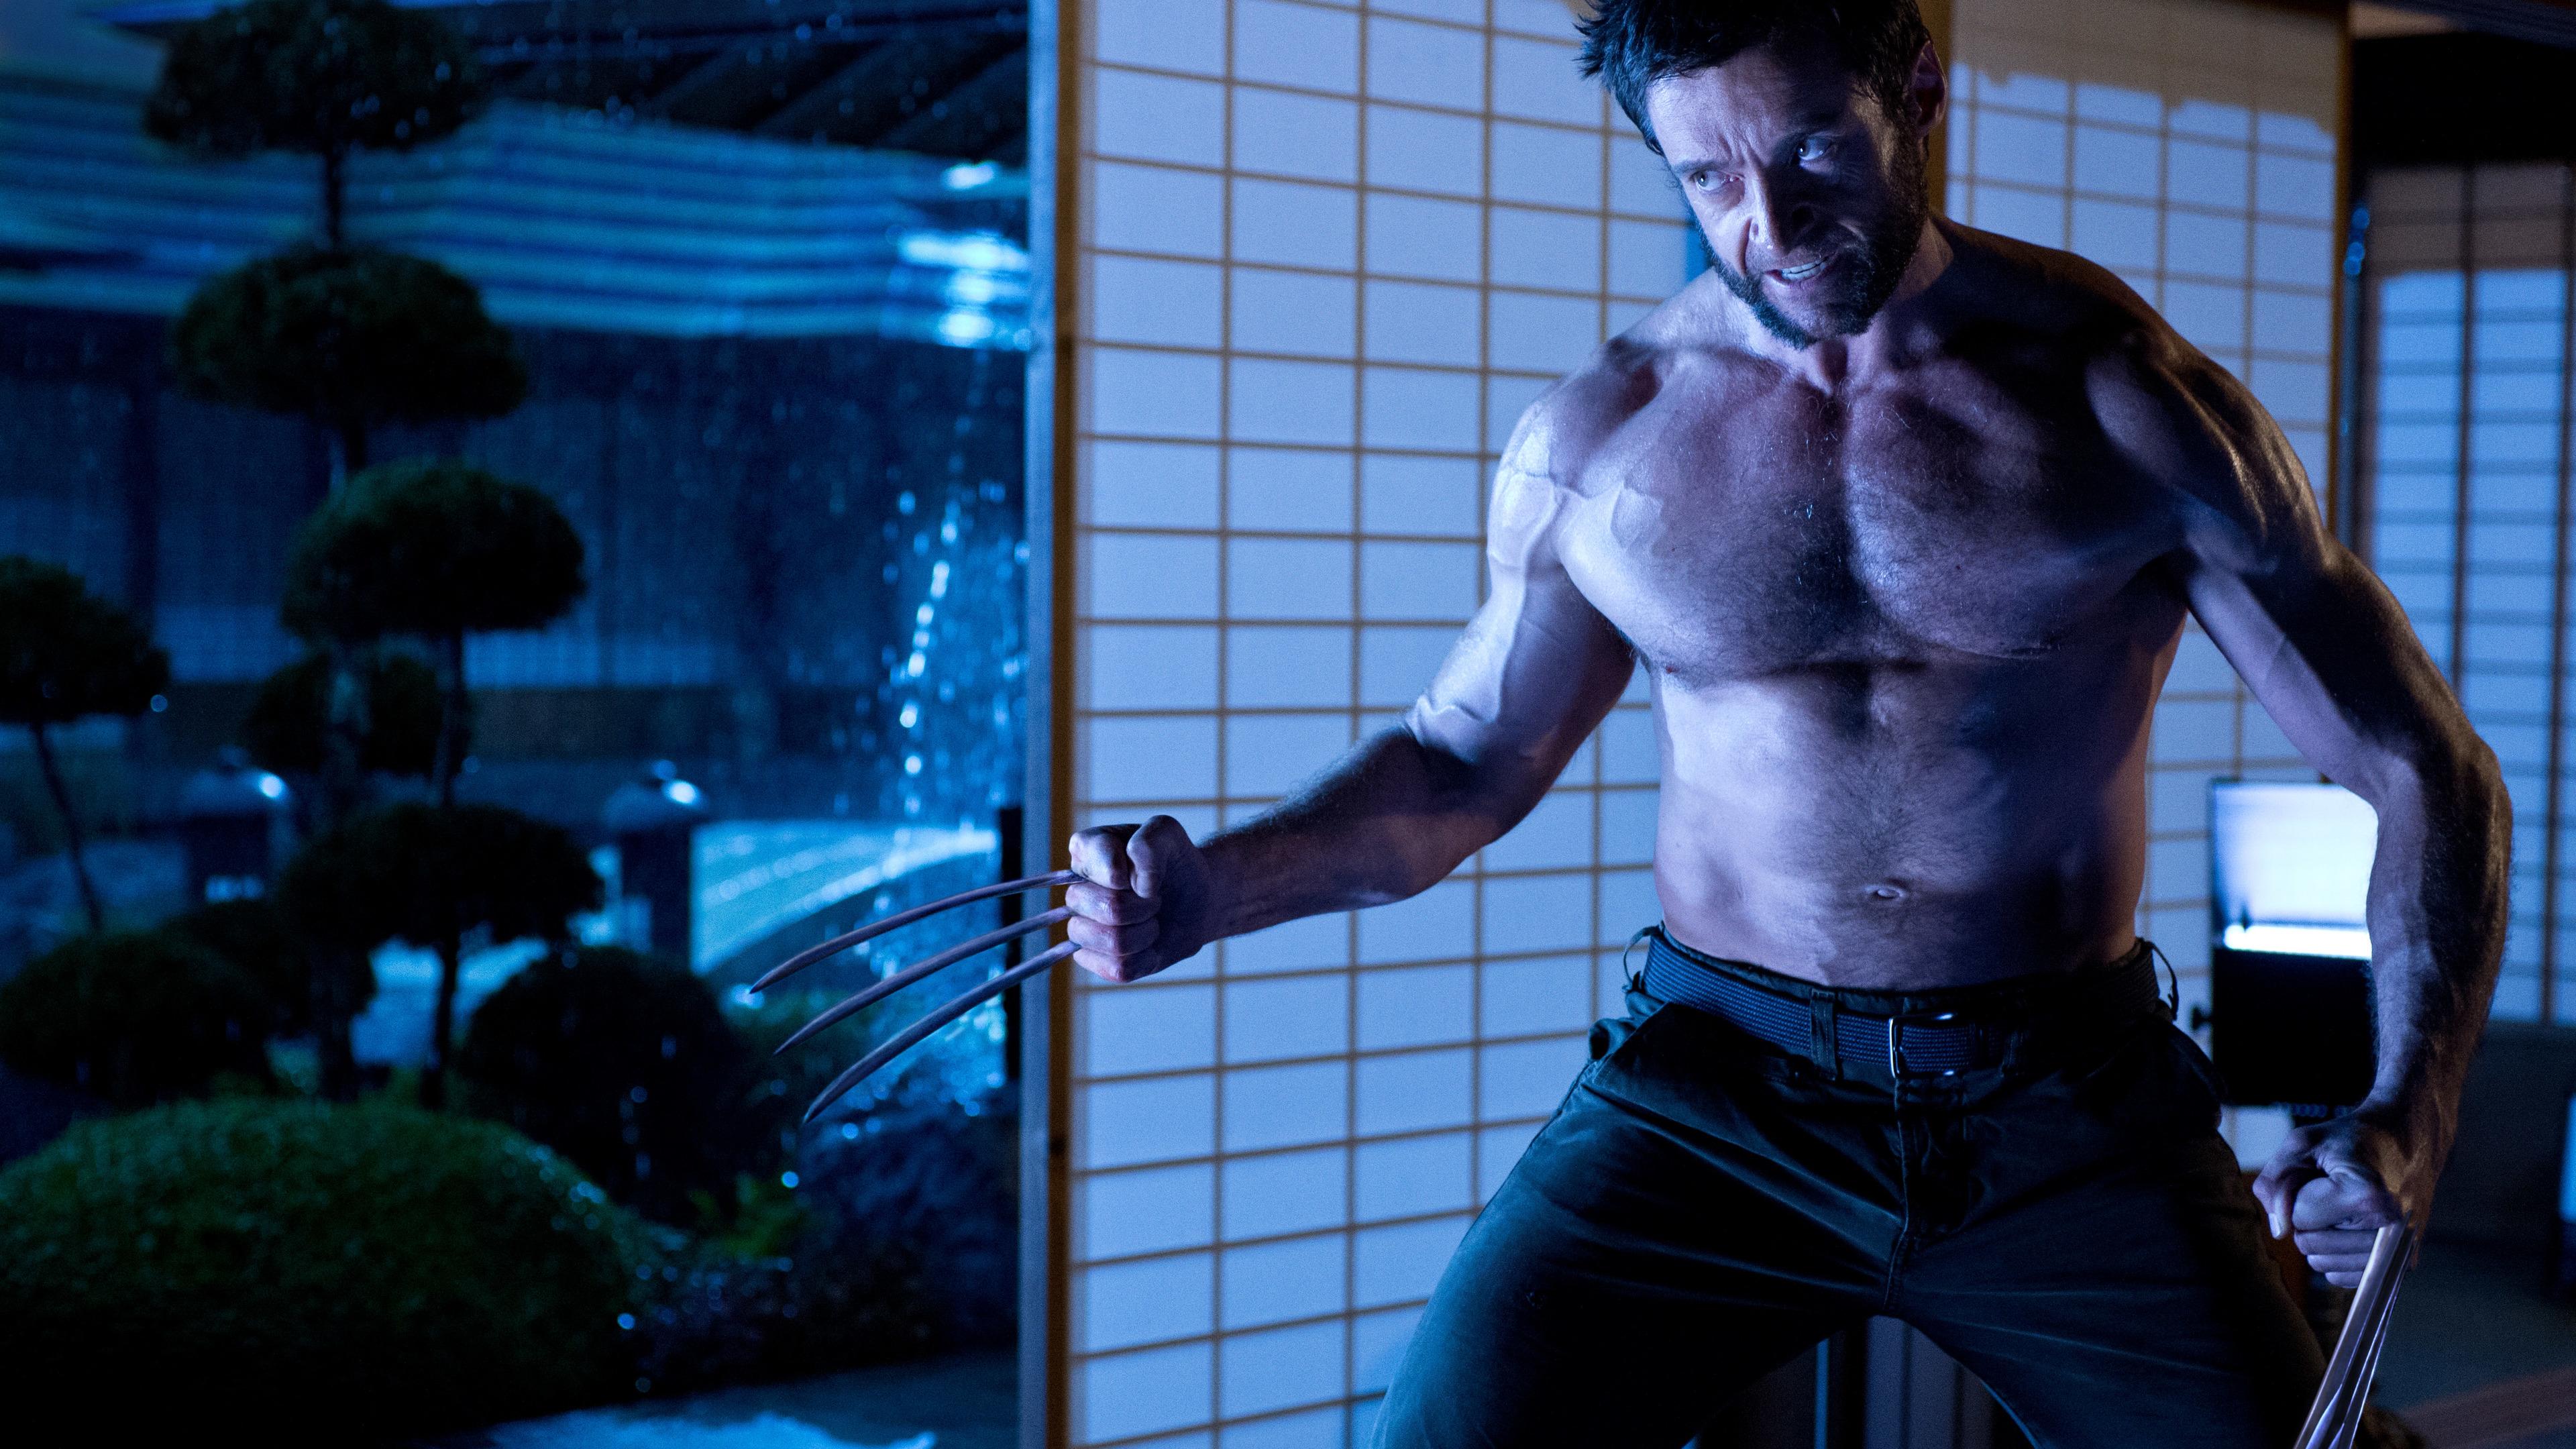 hugh jackman wolverine 1536364206 - Hugh Jackman Wolverine - wolverine wallpapers, movies wallpapers, hugh jackman wallpapers